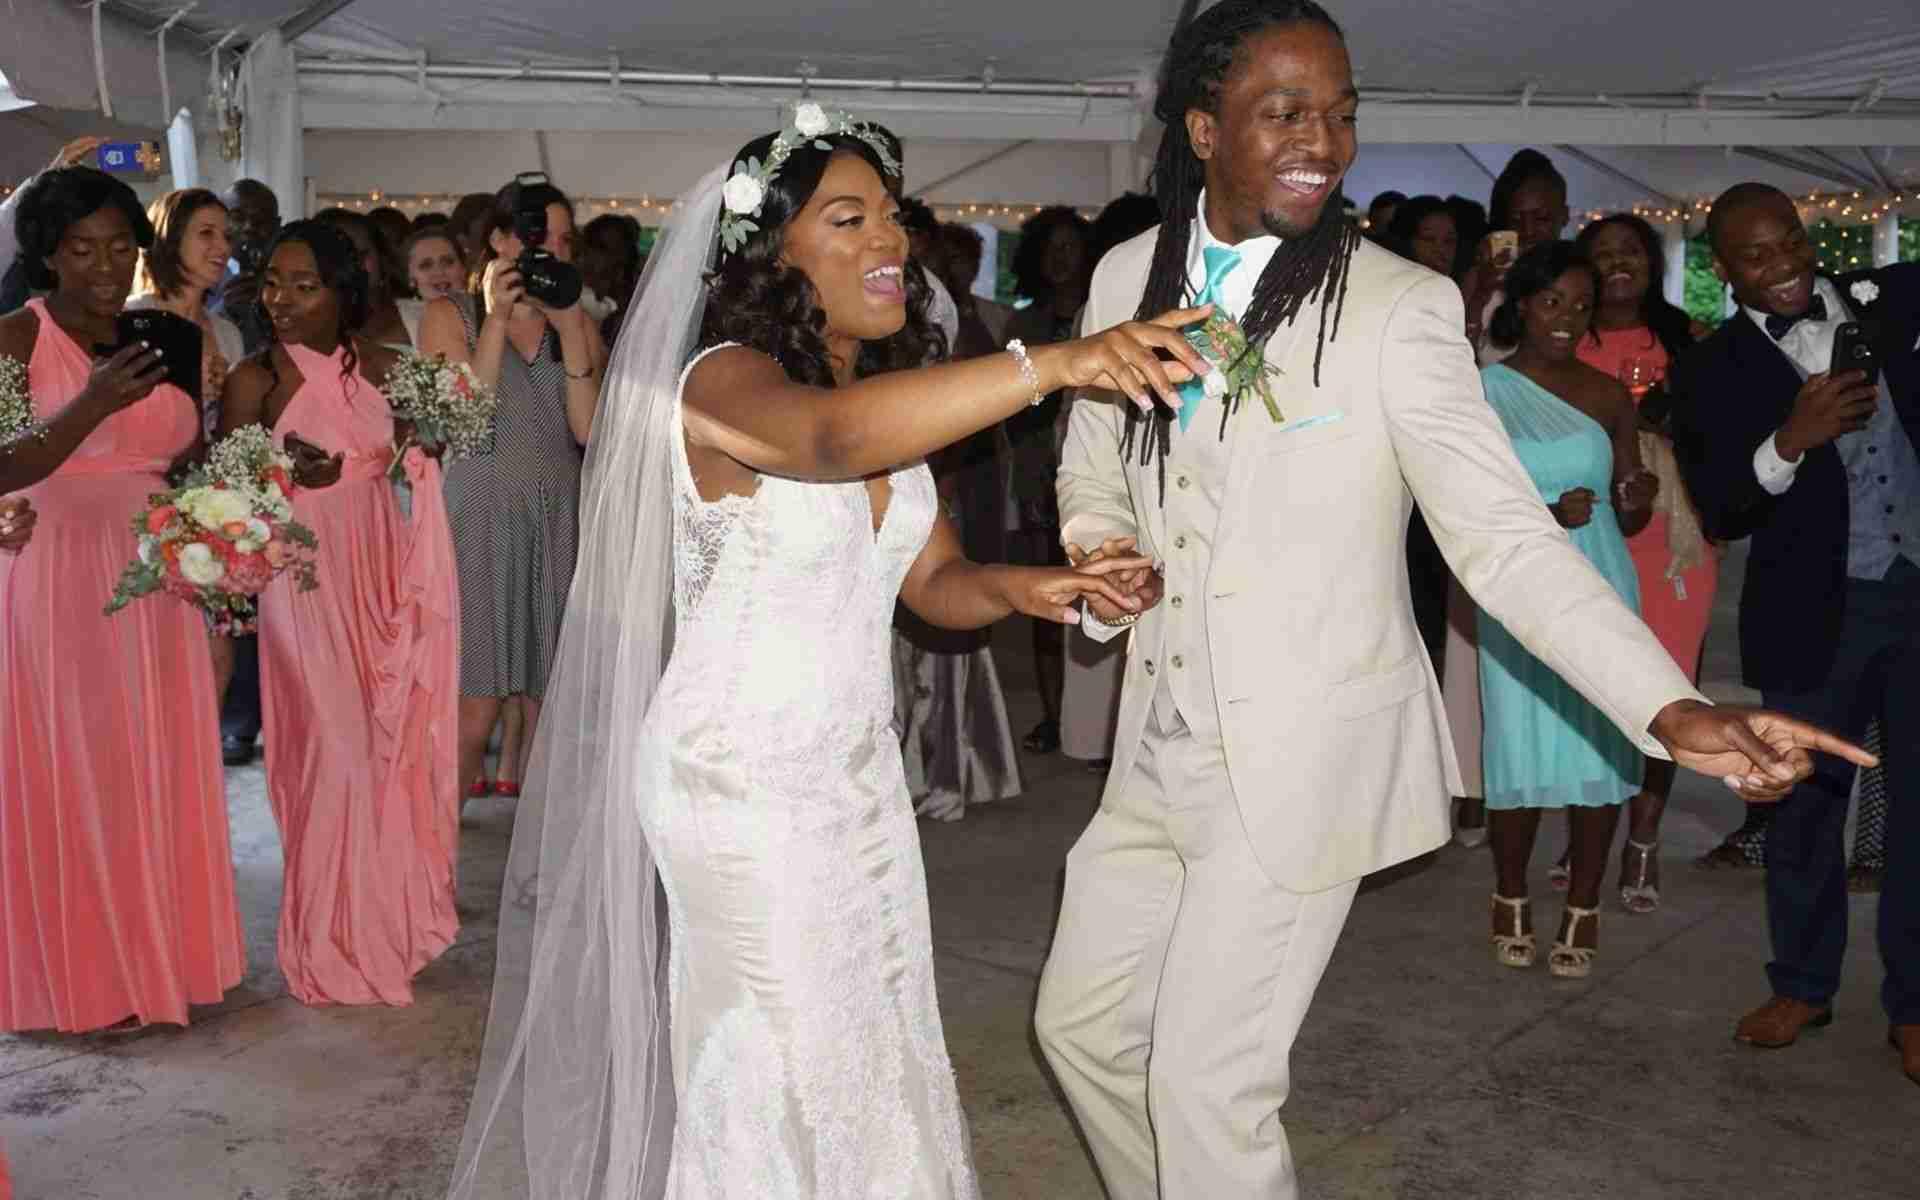 Outdoor Wedding Ceremony and Reception_African-Hatian Wedding Near Savannah GA